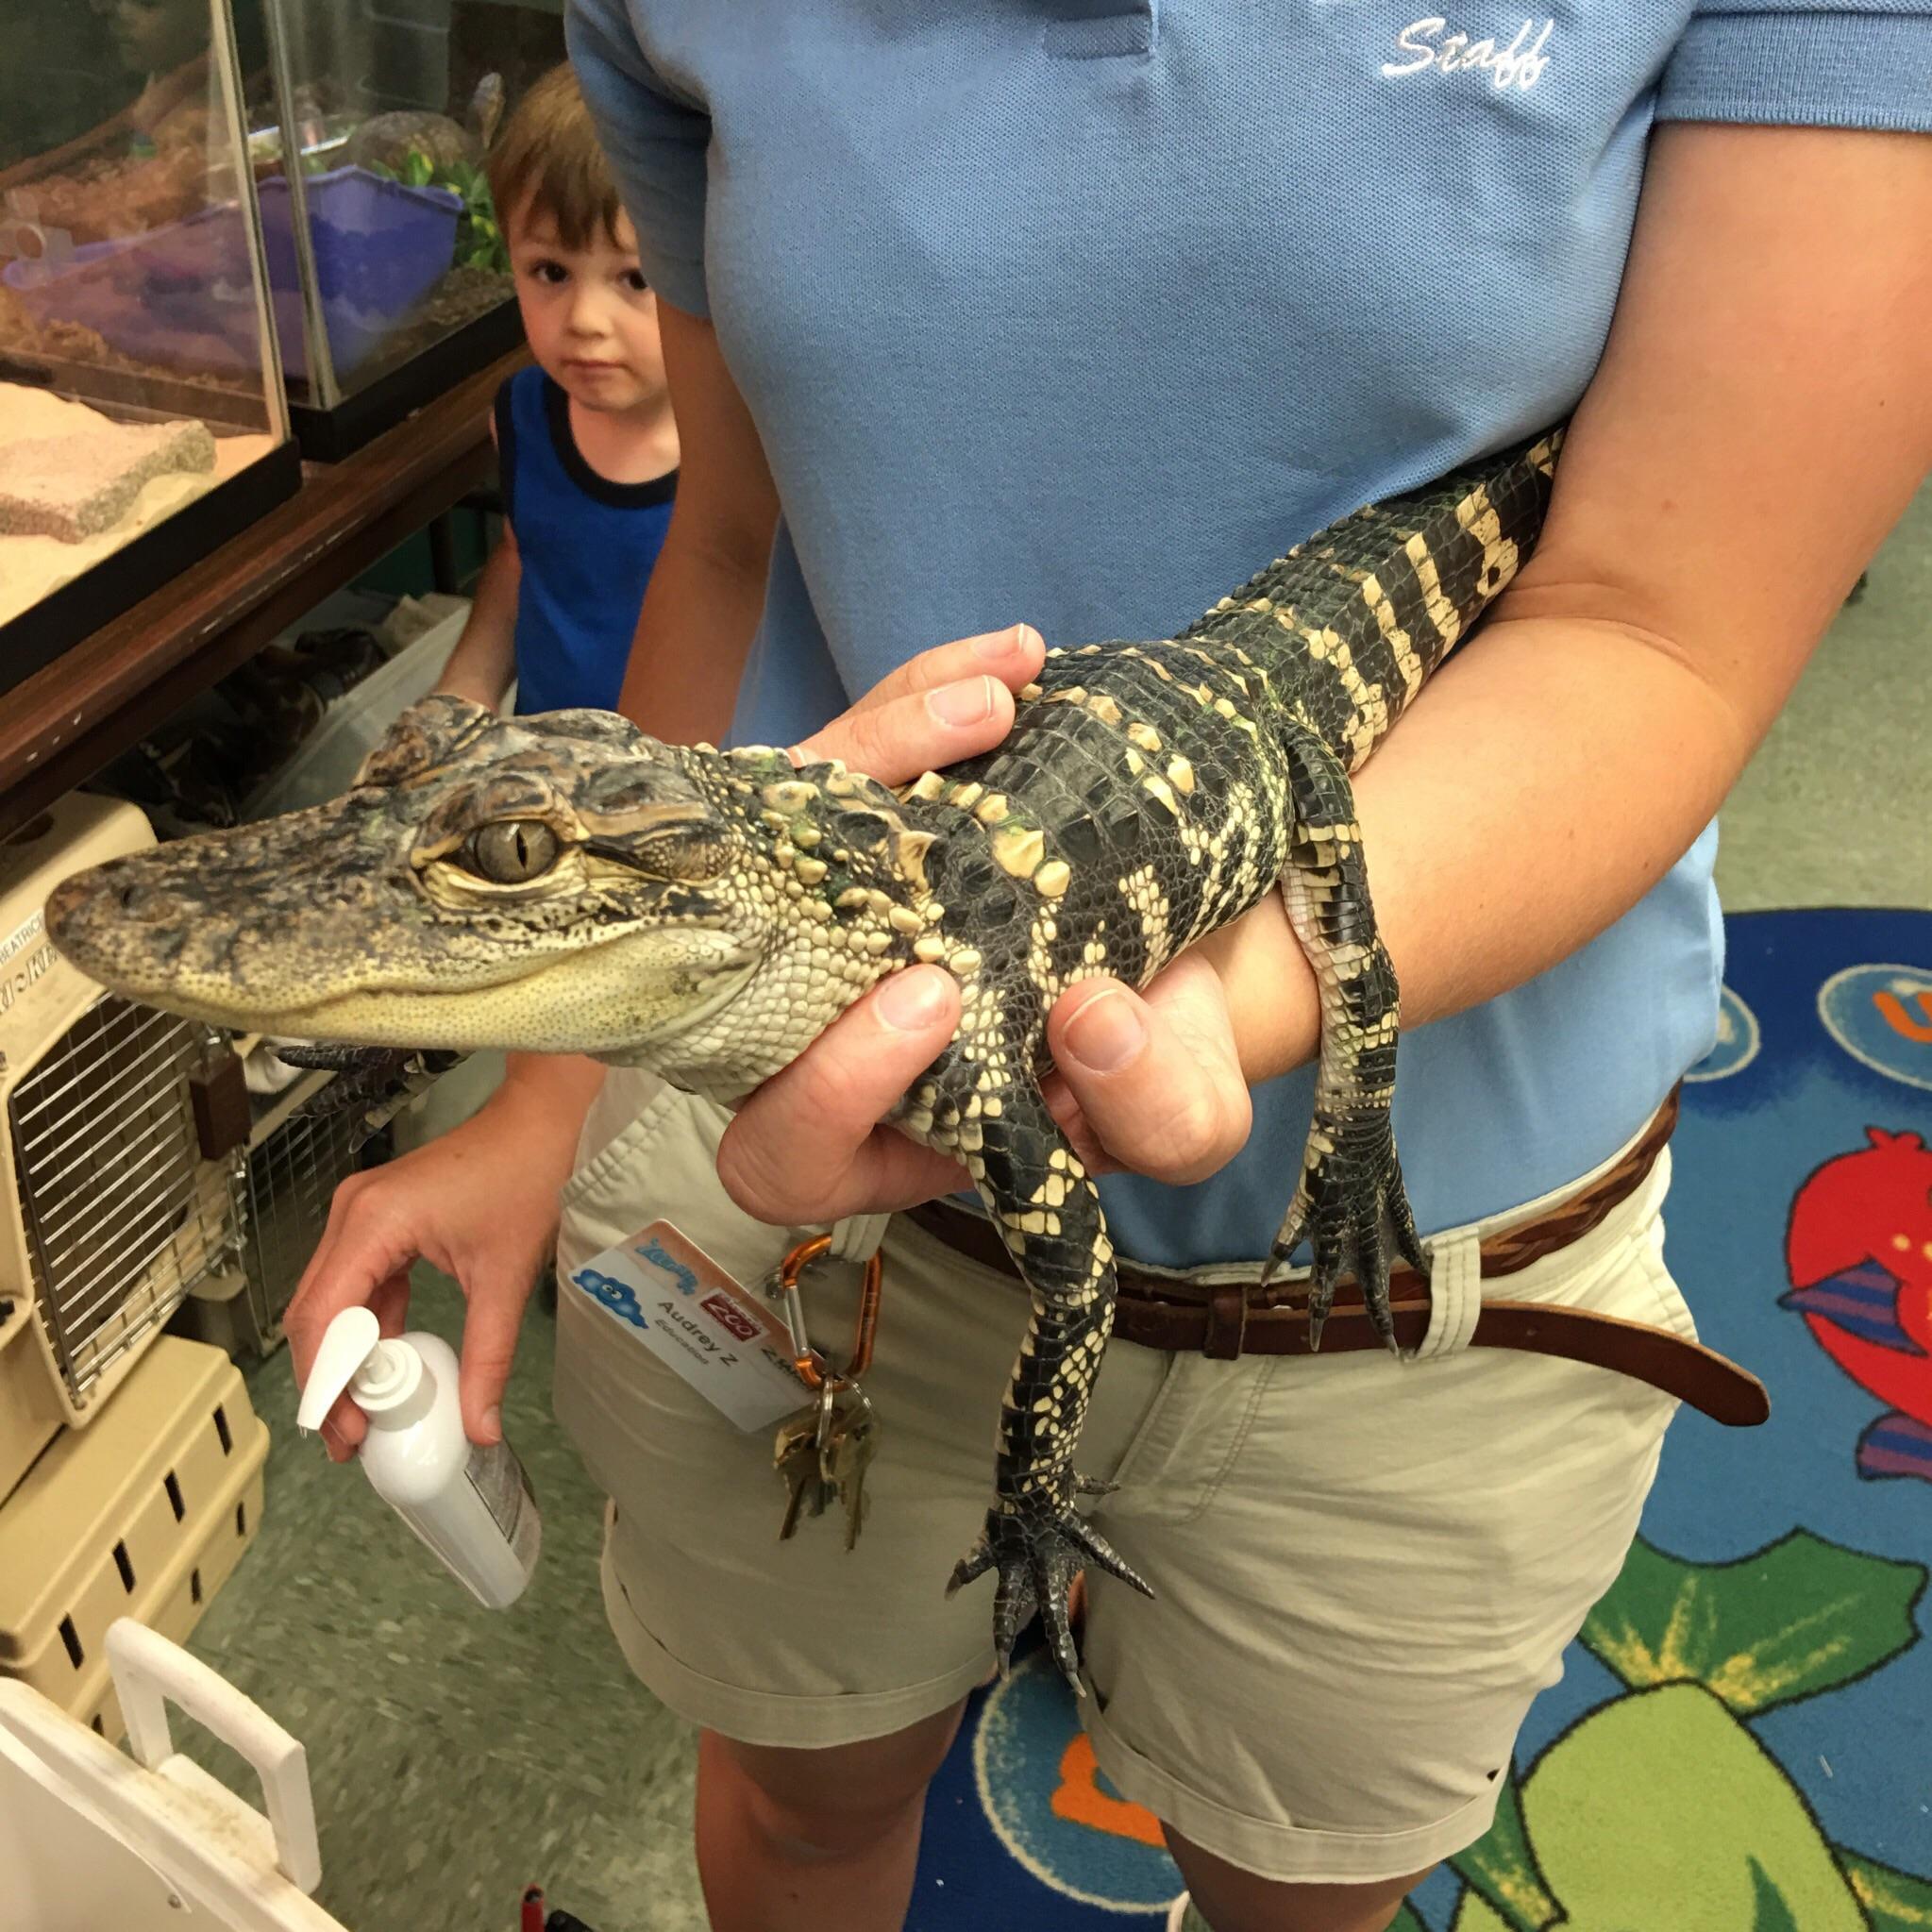 Everyone pet the alligator!